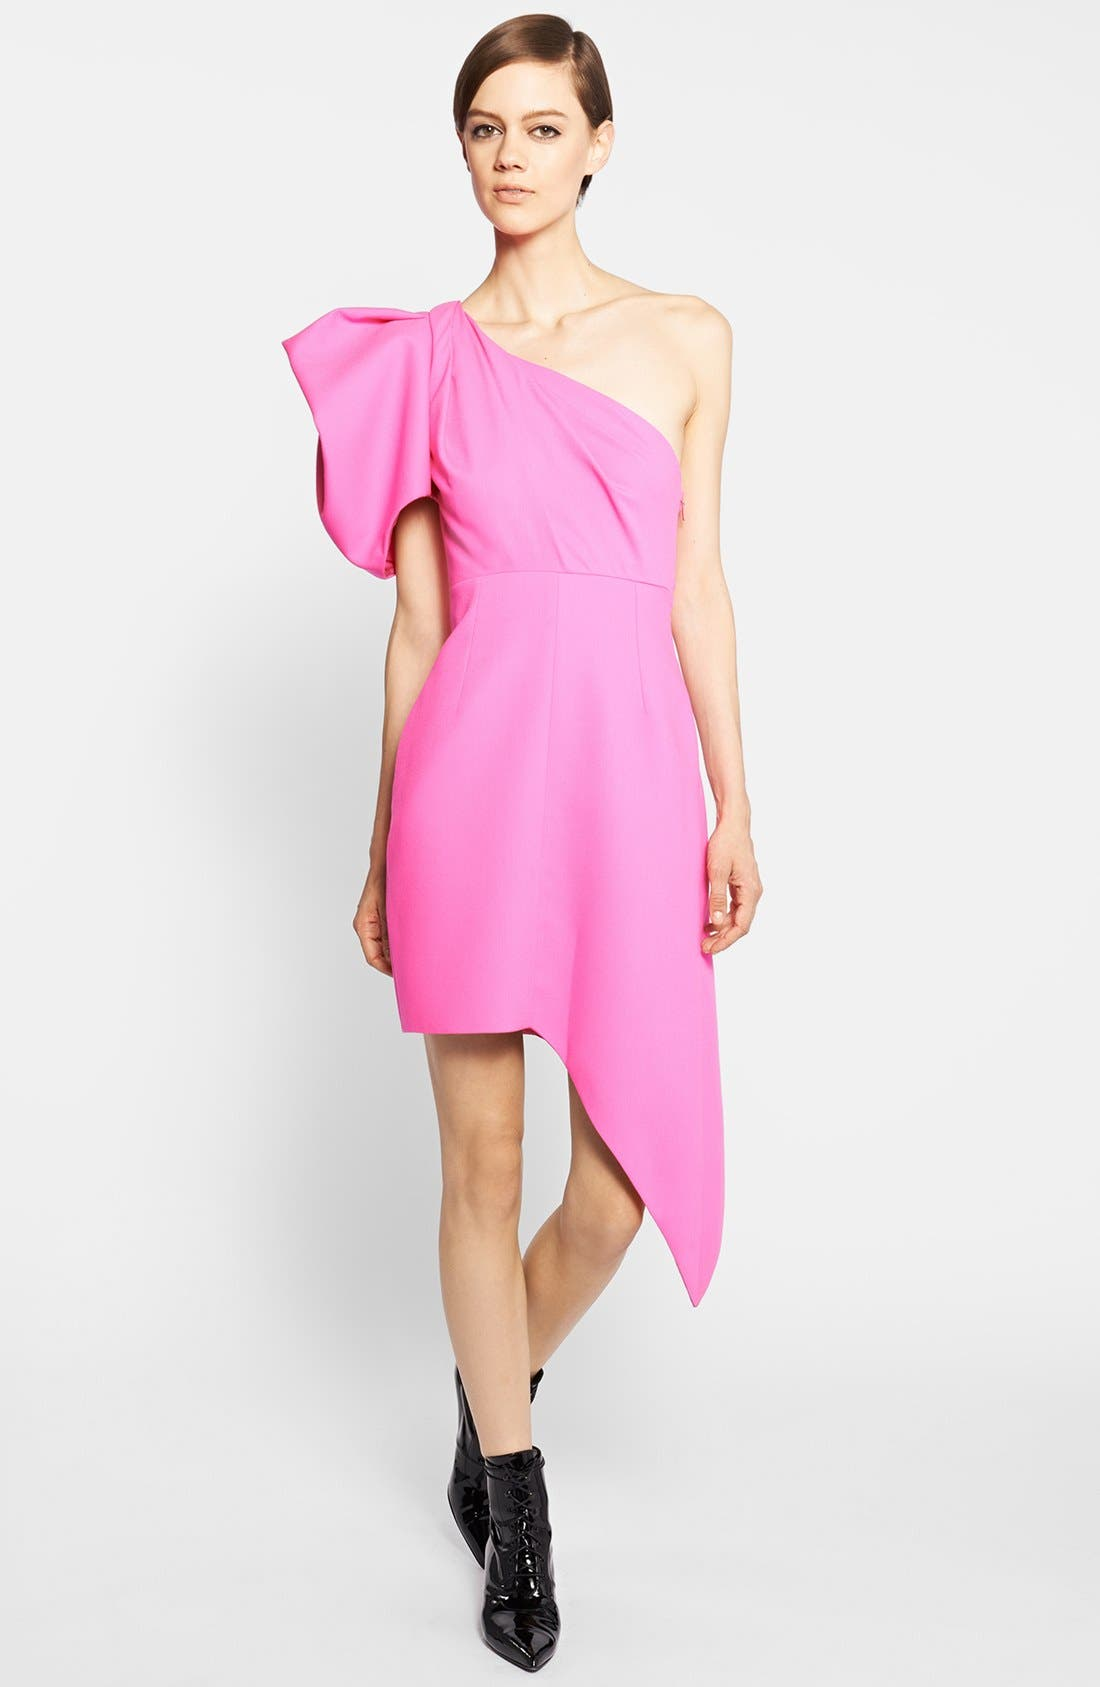 Alternate Image 1 Selected - Saint Laurent Puffed One-Shoulder Dress